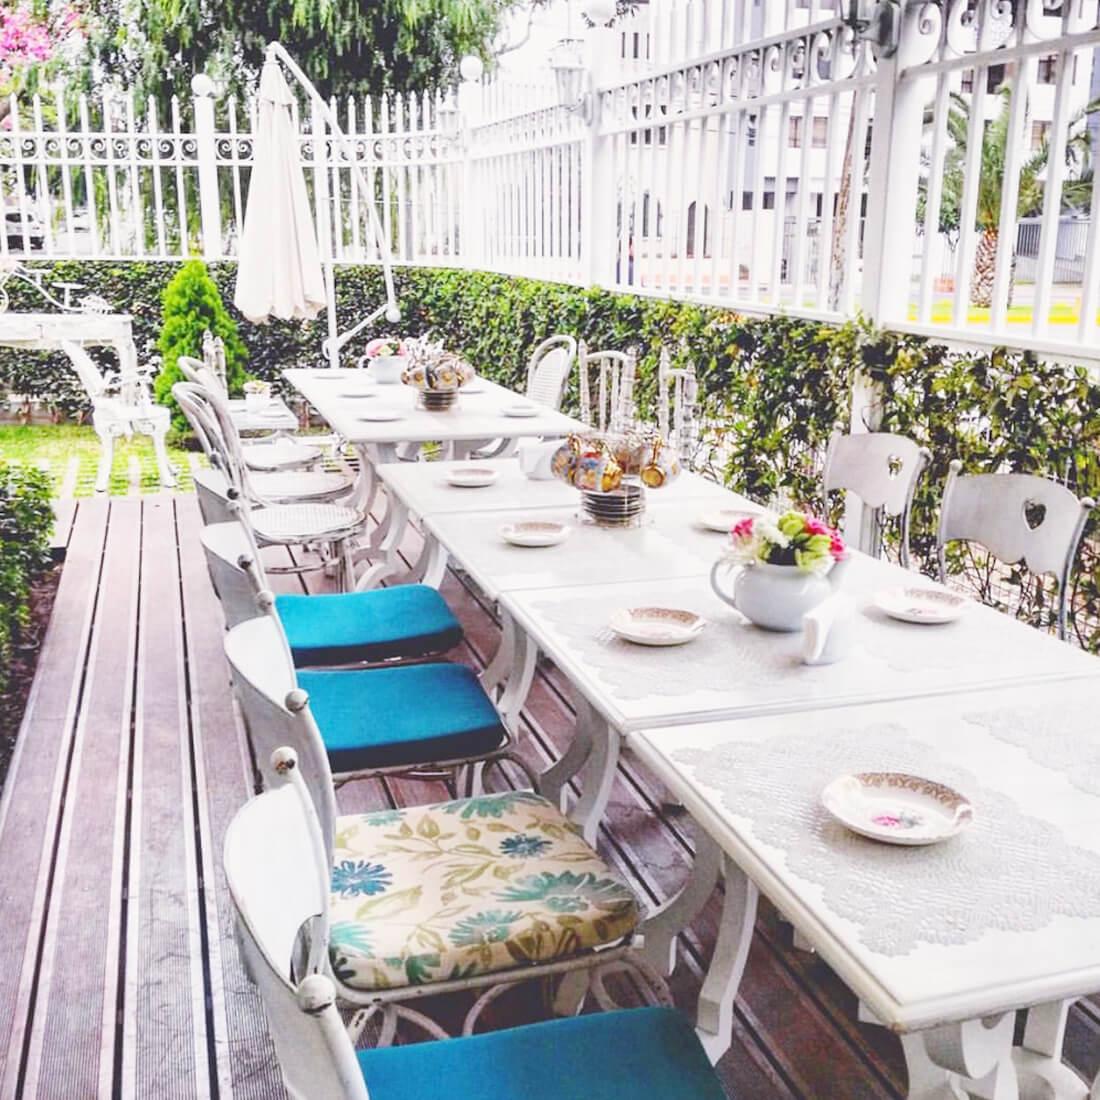 LAS BOLENA TEA ROOM & RESTAURANT Restaurante - Reserva en restaurantes de Comida INTERNACIONAL - MIRAFLORES - MESA 24/7 | LIMA - Perú